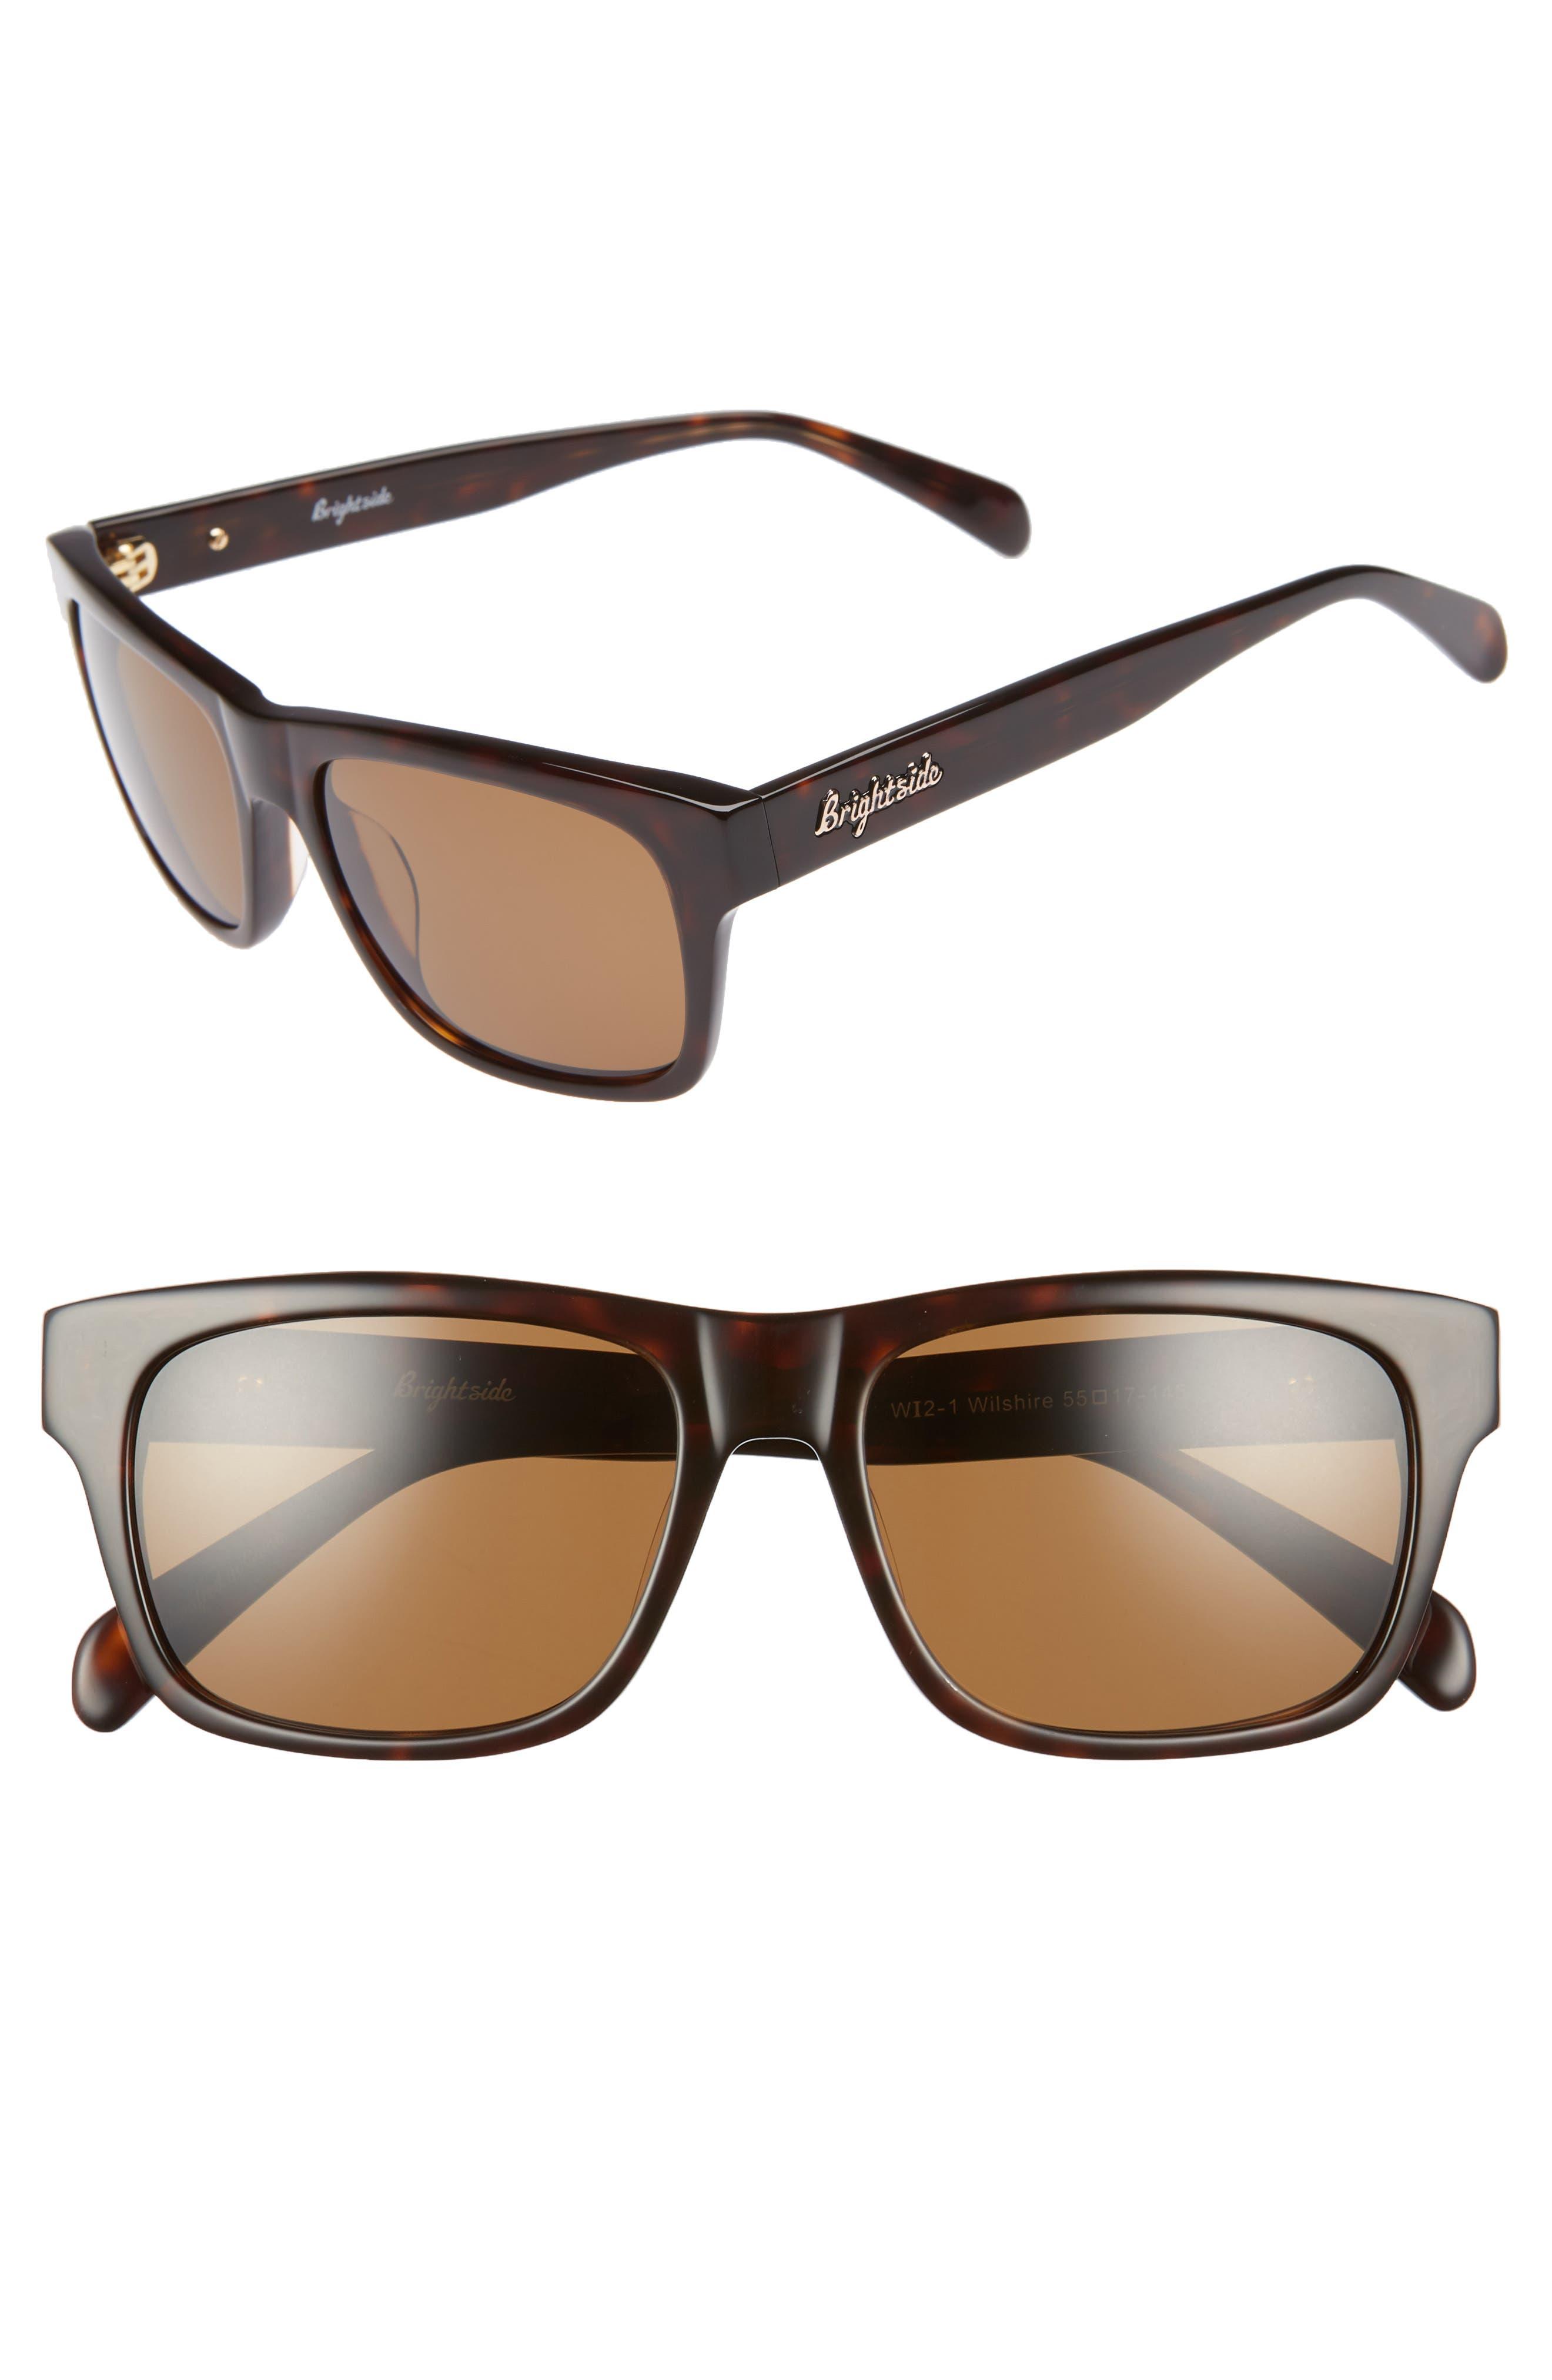 Wilshire 55mm Square Sunglasses